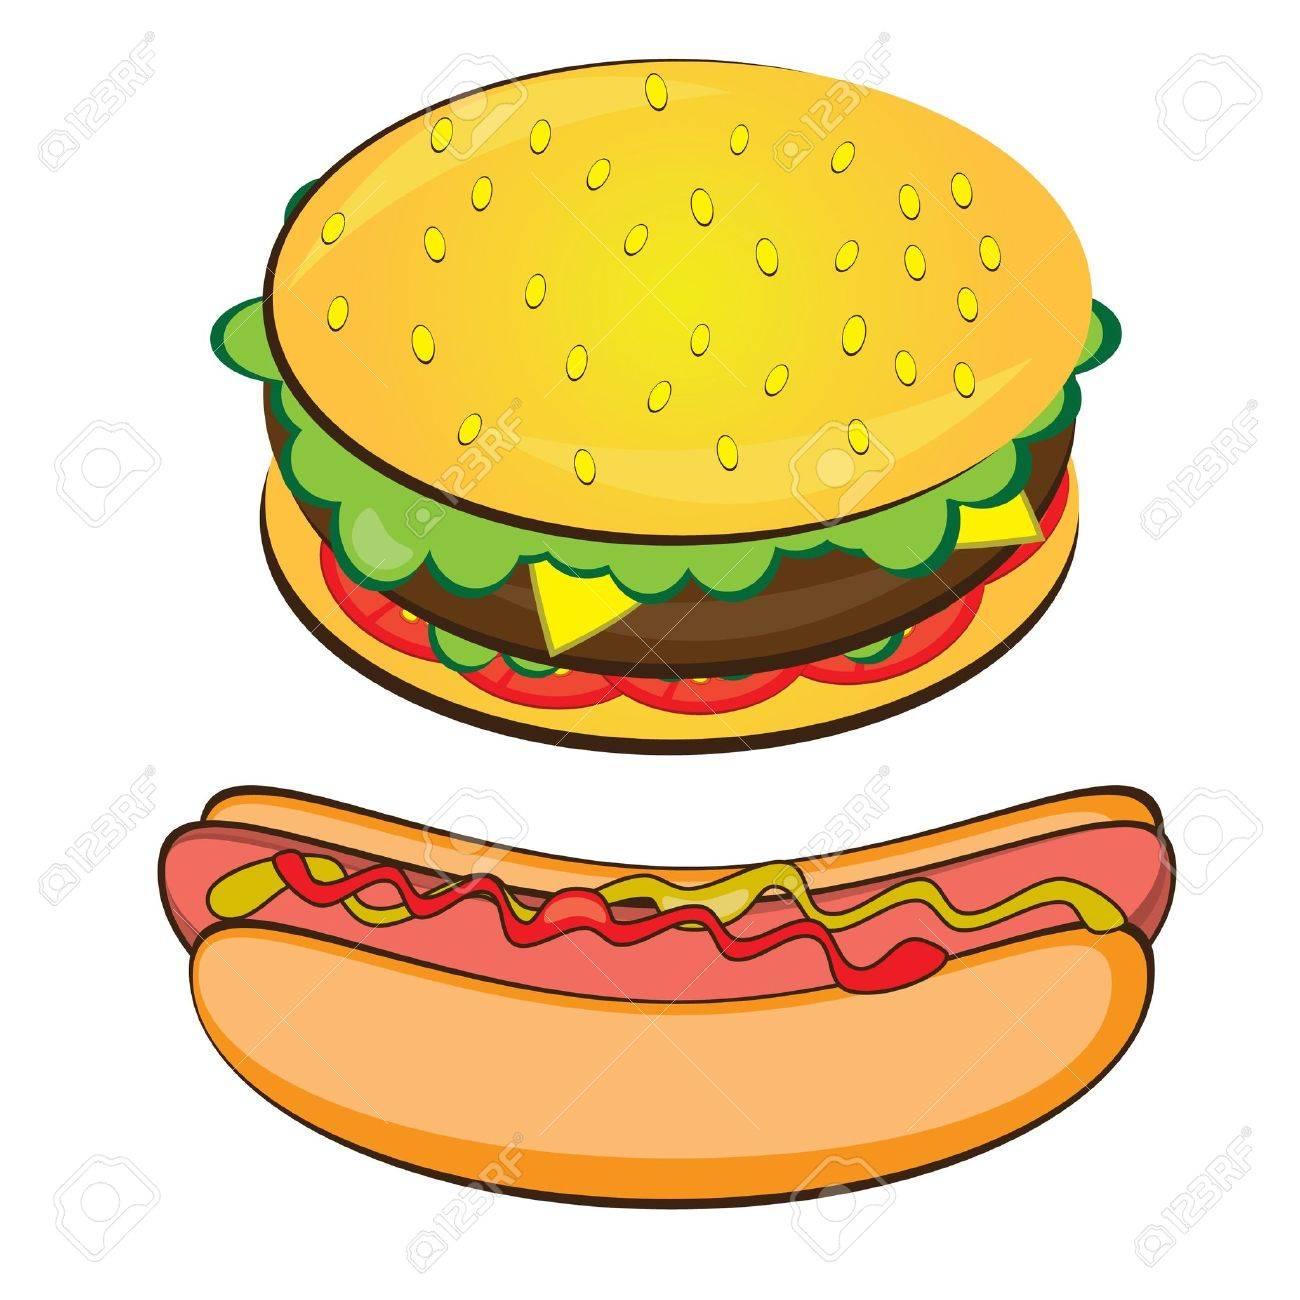 Hamburgers And Hotdogs Clipart 8889966-Appetizing-Hotdog-and-